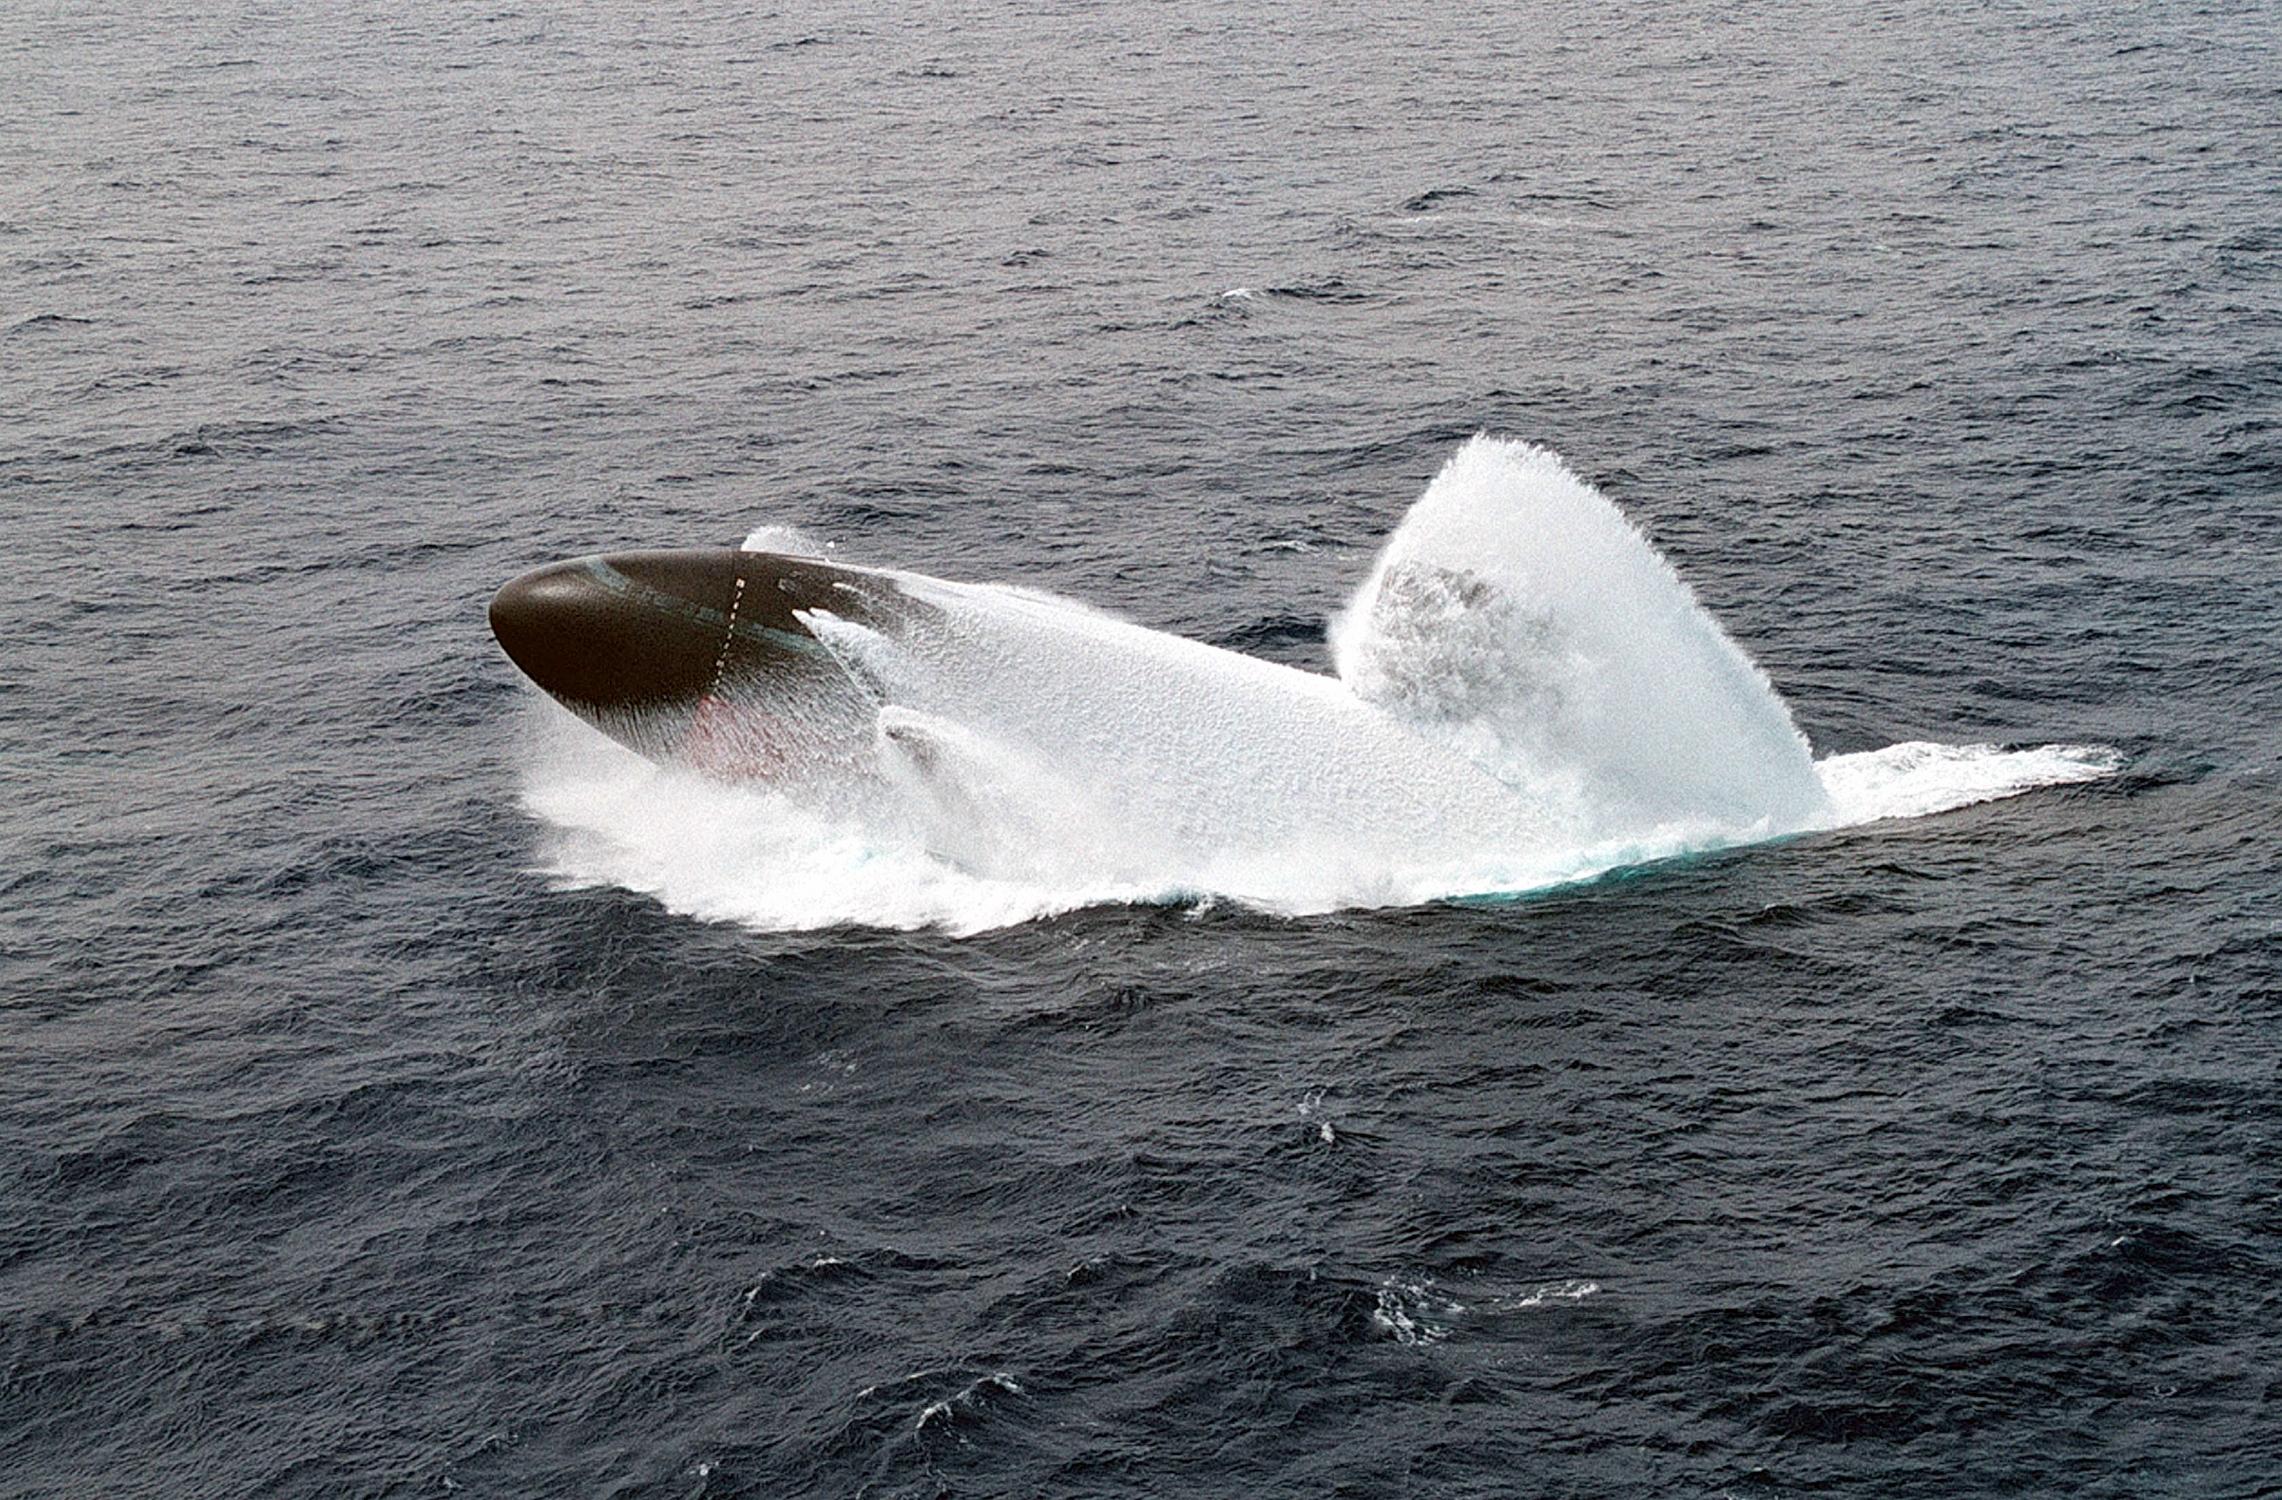 سلاح الغواصات Gpw-20060917-UnitedStates-DefenseVisualCenter-DNSD0310300-submarine-emergency-surfacing-drill-Pacific-Ocean-USS-Columbus-SSN-762-19980604-Hawaii-medium